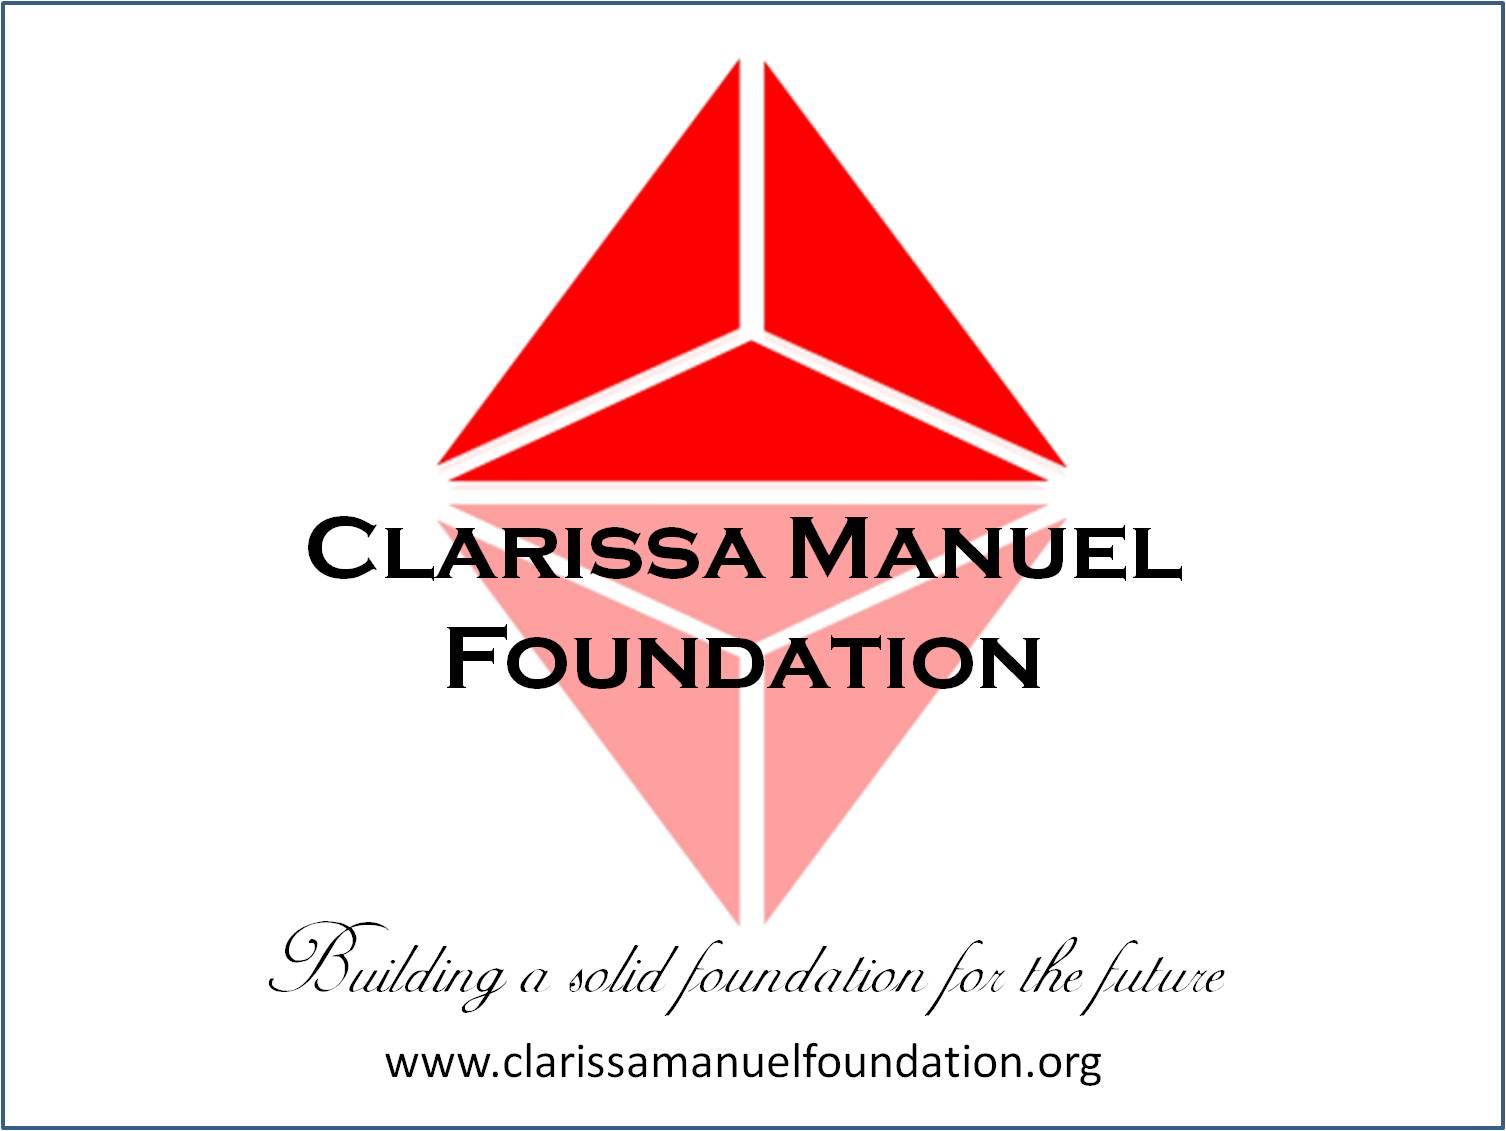 contact@clarissamanuelfoundation.org